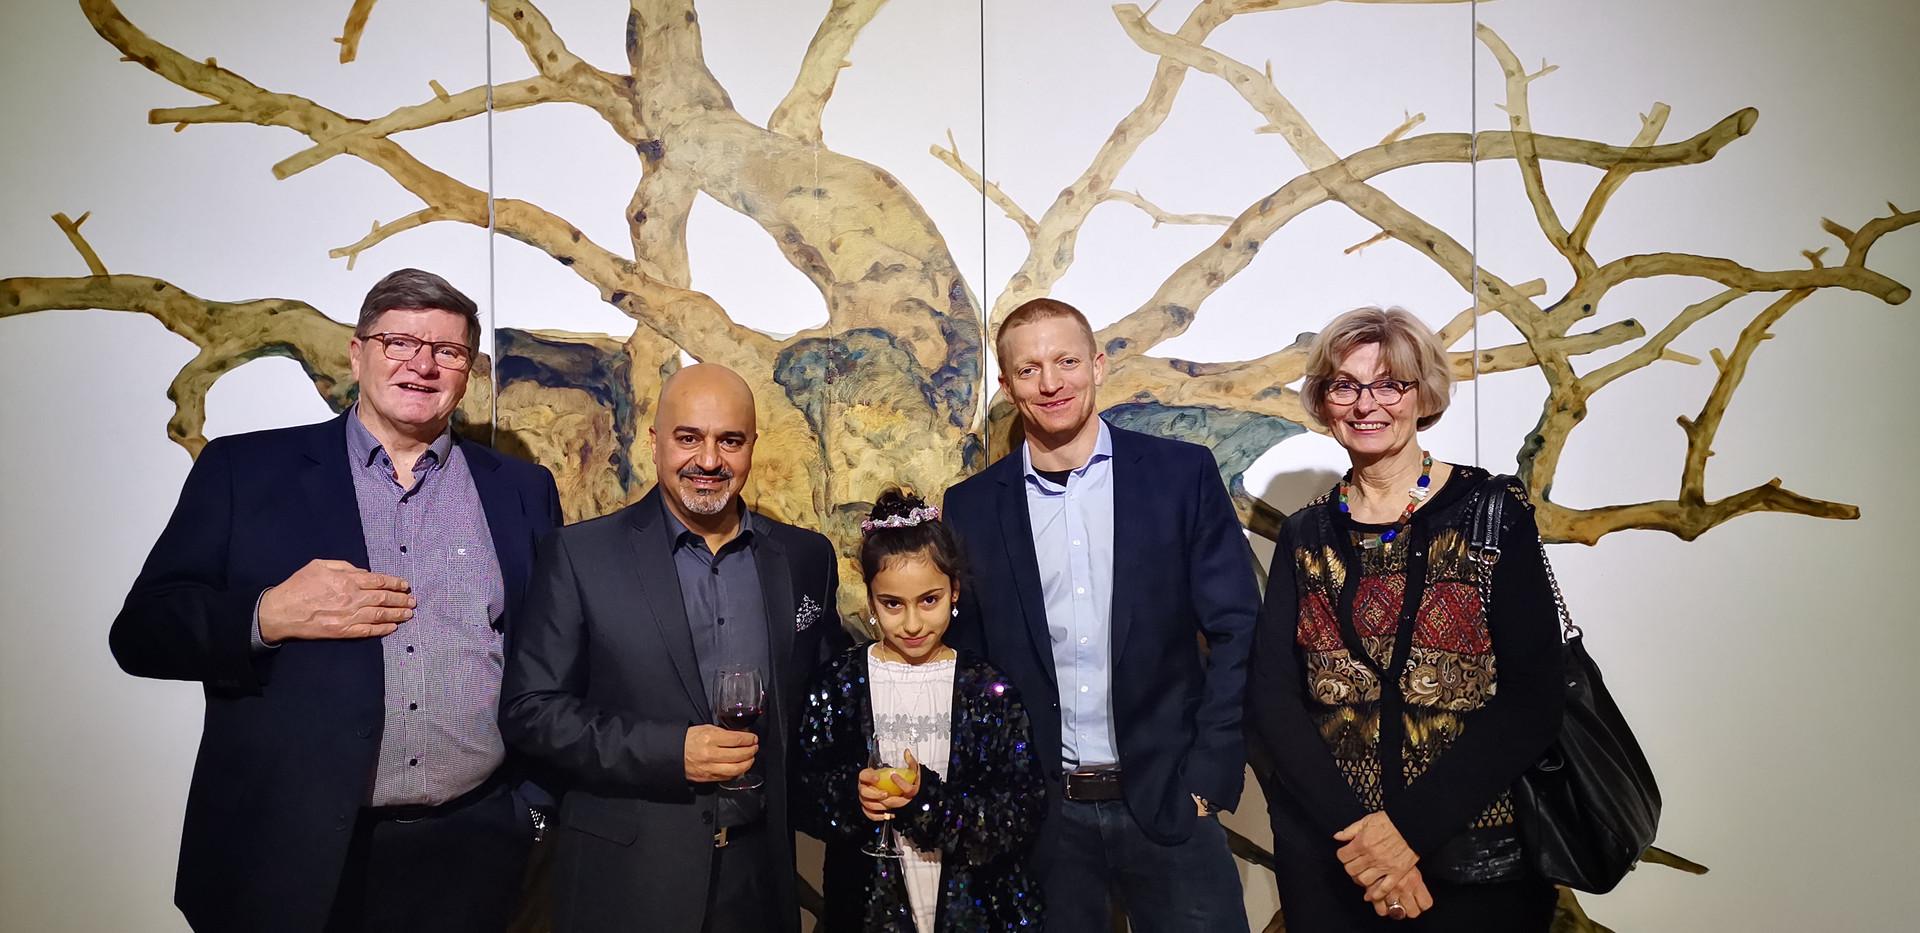 Georg Loven, Nour Nouri, Nuesh Nouri, Peter Loven, Marita Loven